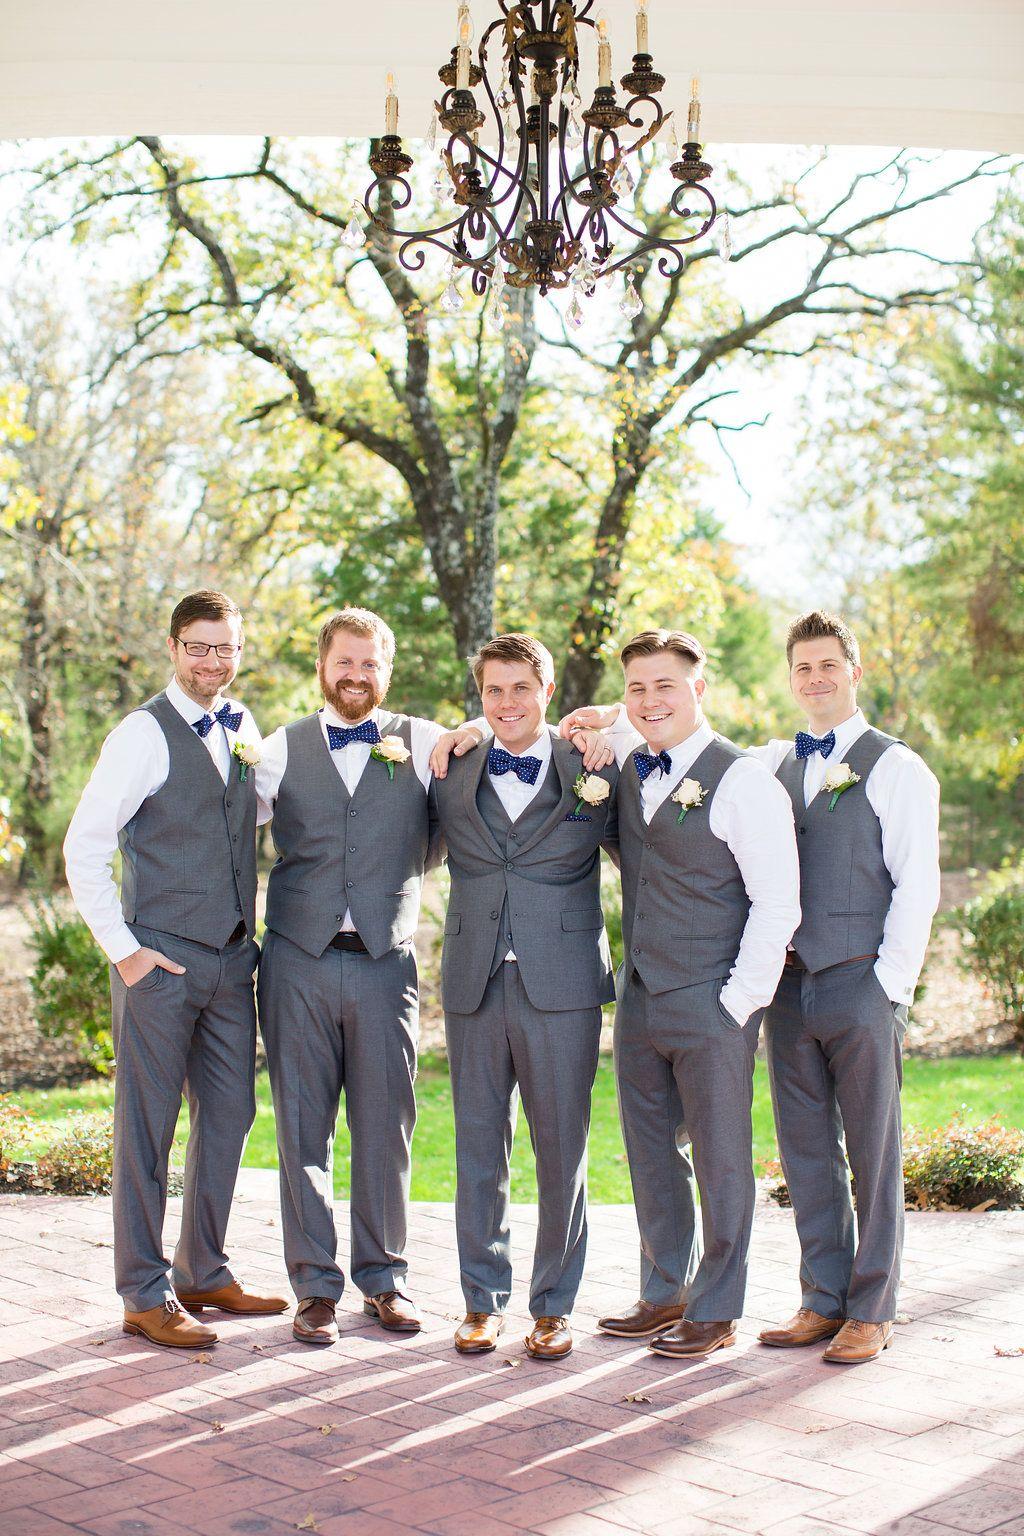 Groomsmen In Gray Vests Navy Blue Bow Ties Spring Wedding Groomsmen Ideas Groom Photography Wedding Groomsmen Wedding Party Groomsmen Wedding Groomsmen